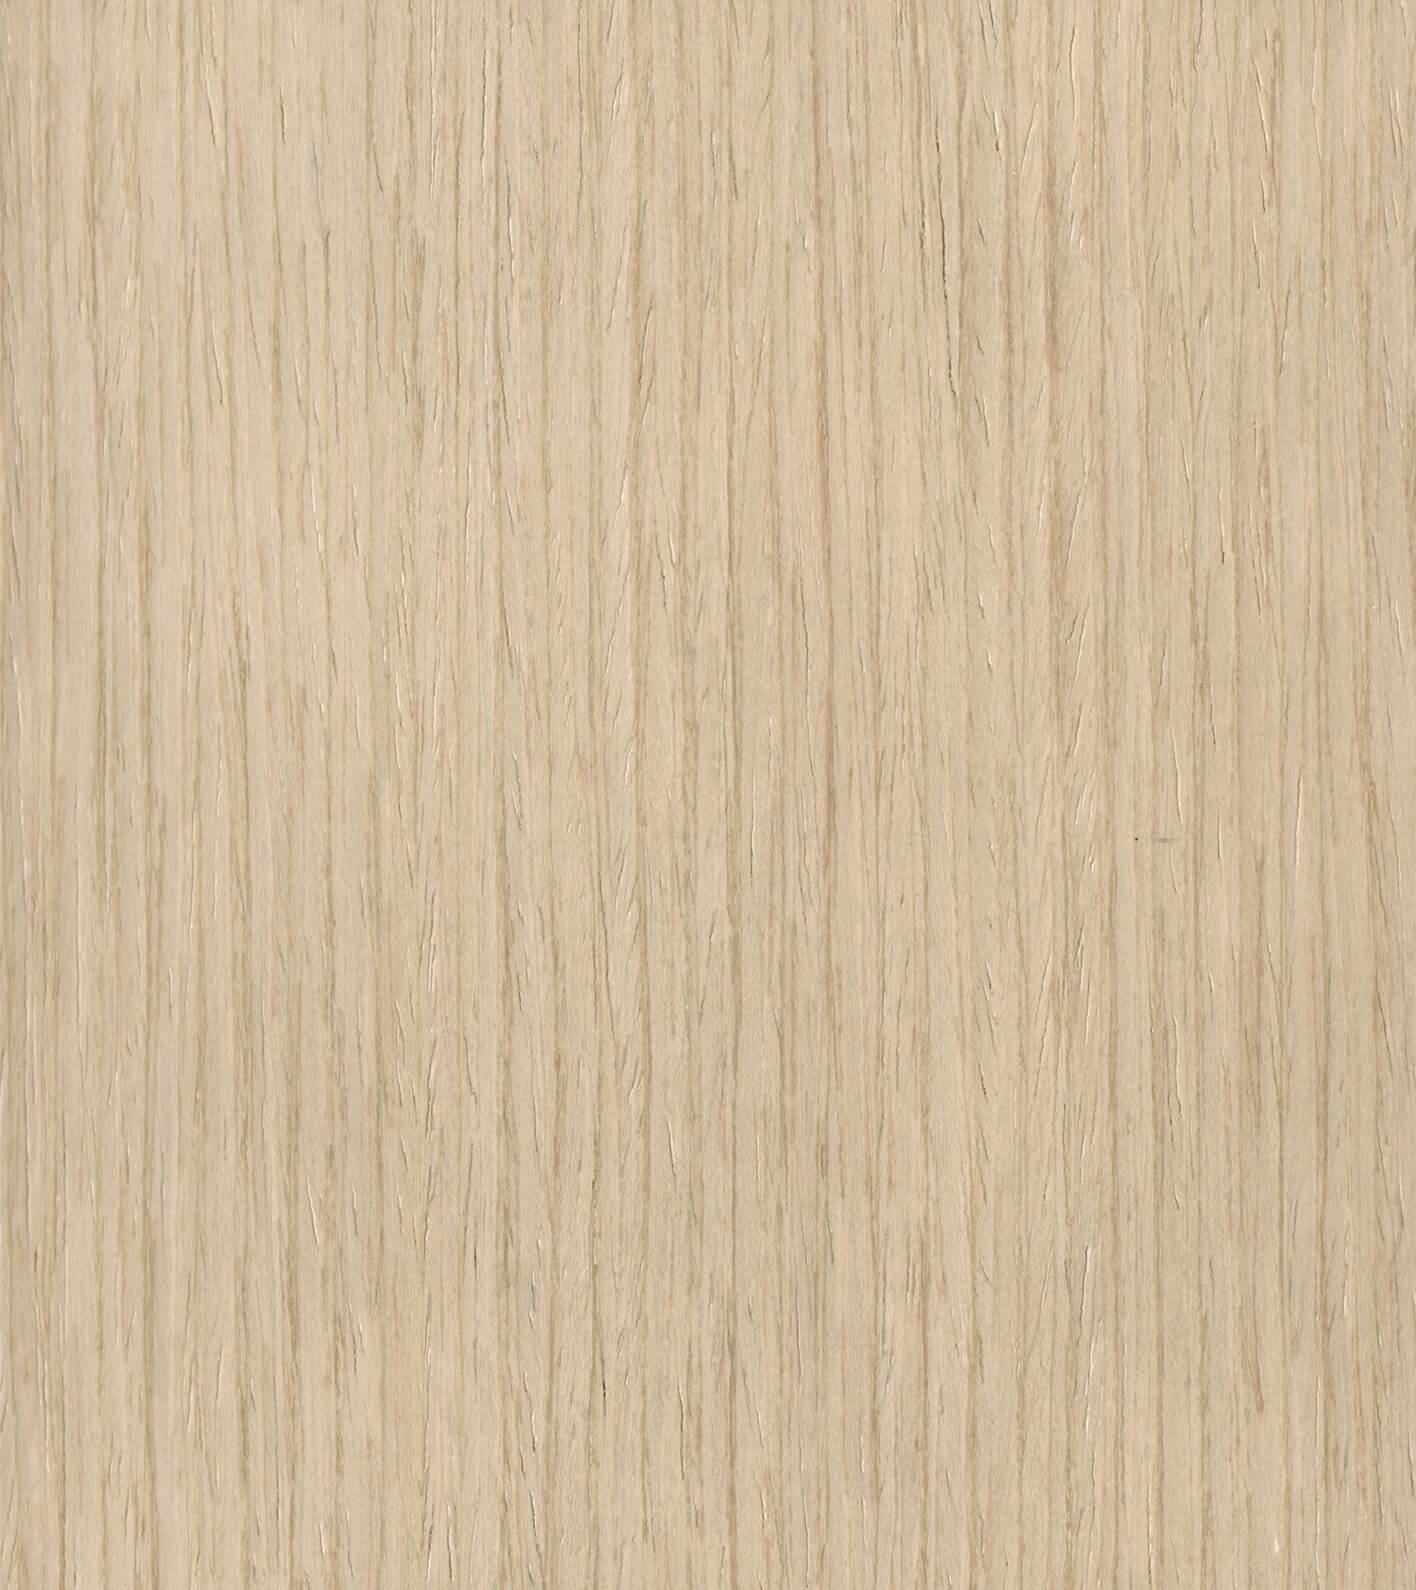 Coriander Stain on Straight Grain Oak Exotic Veneer